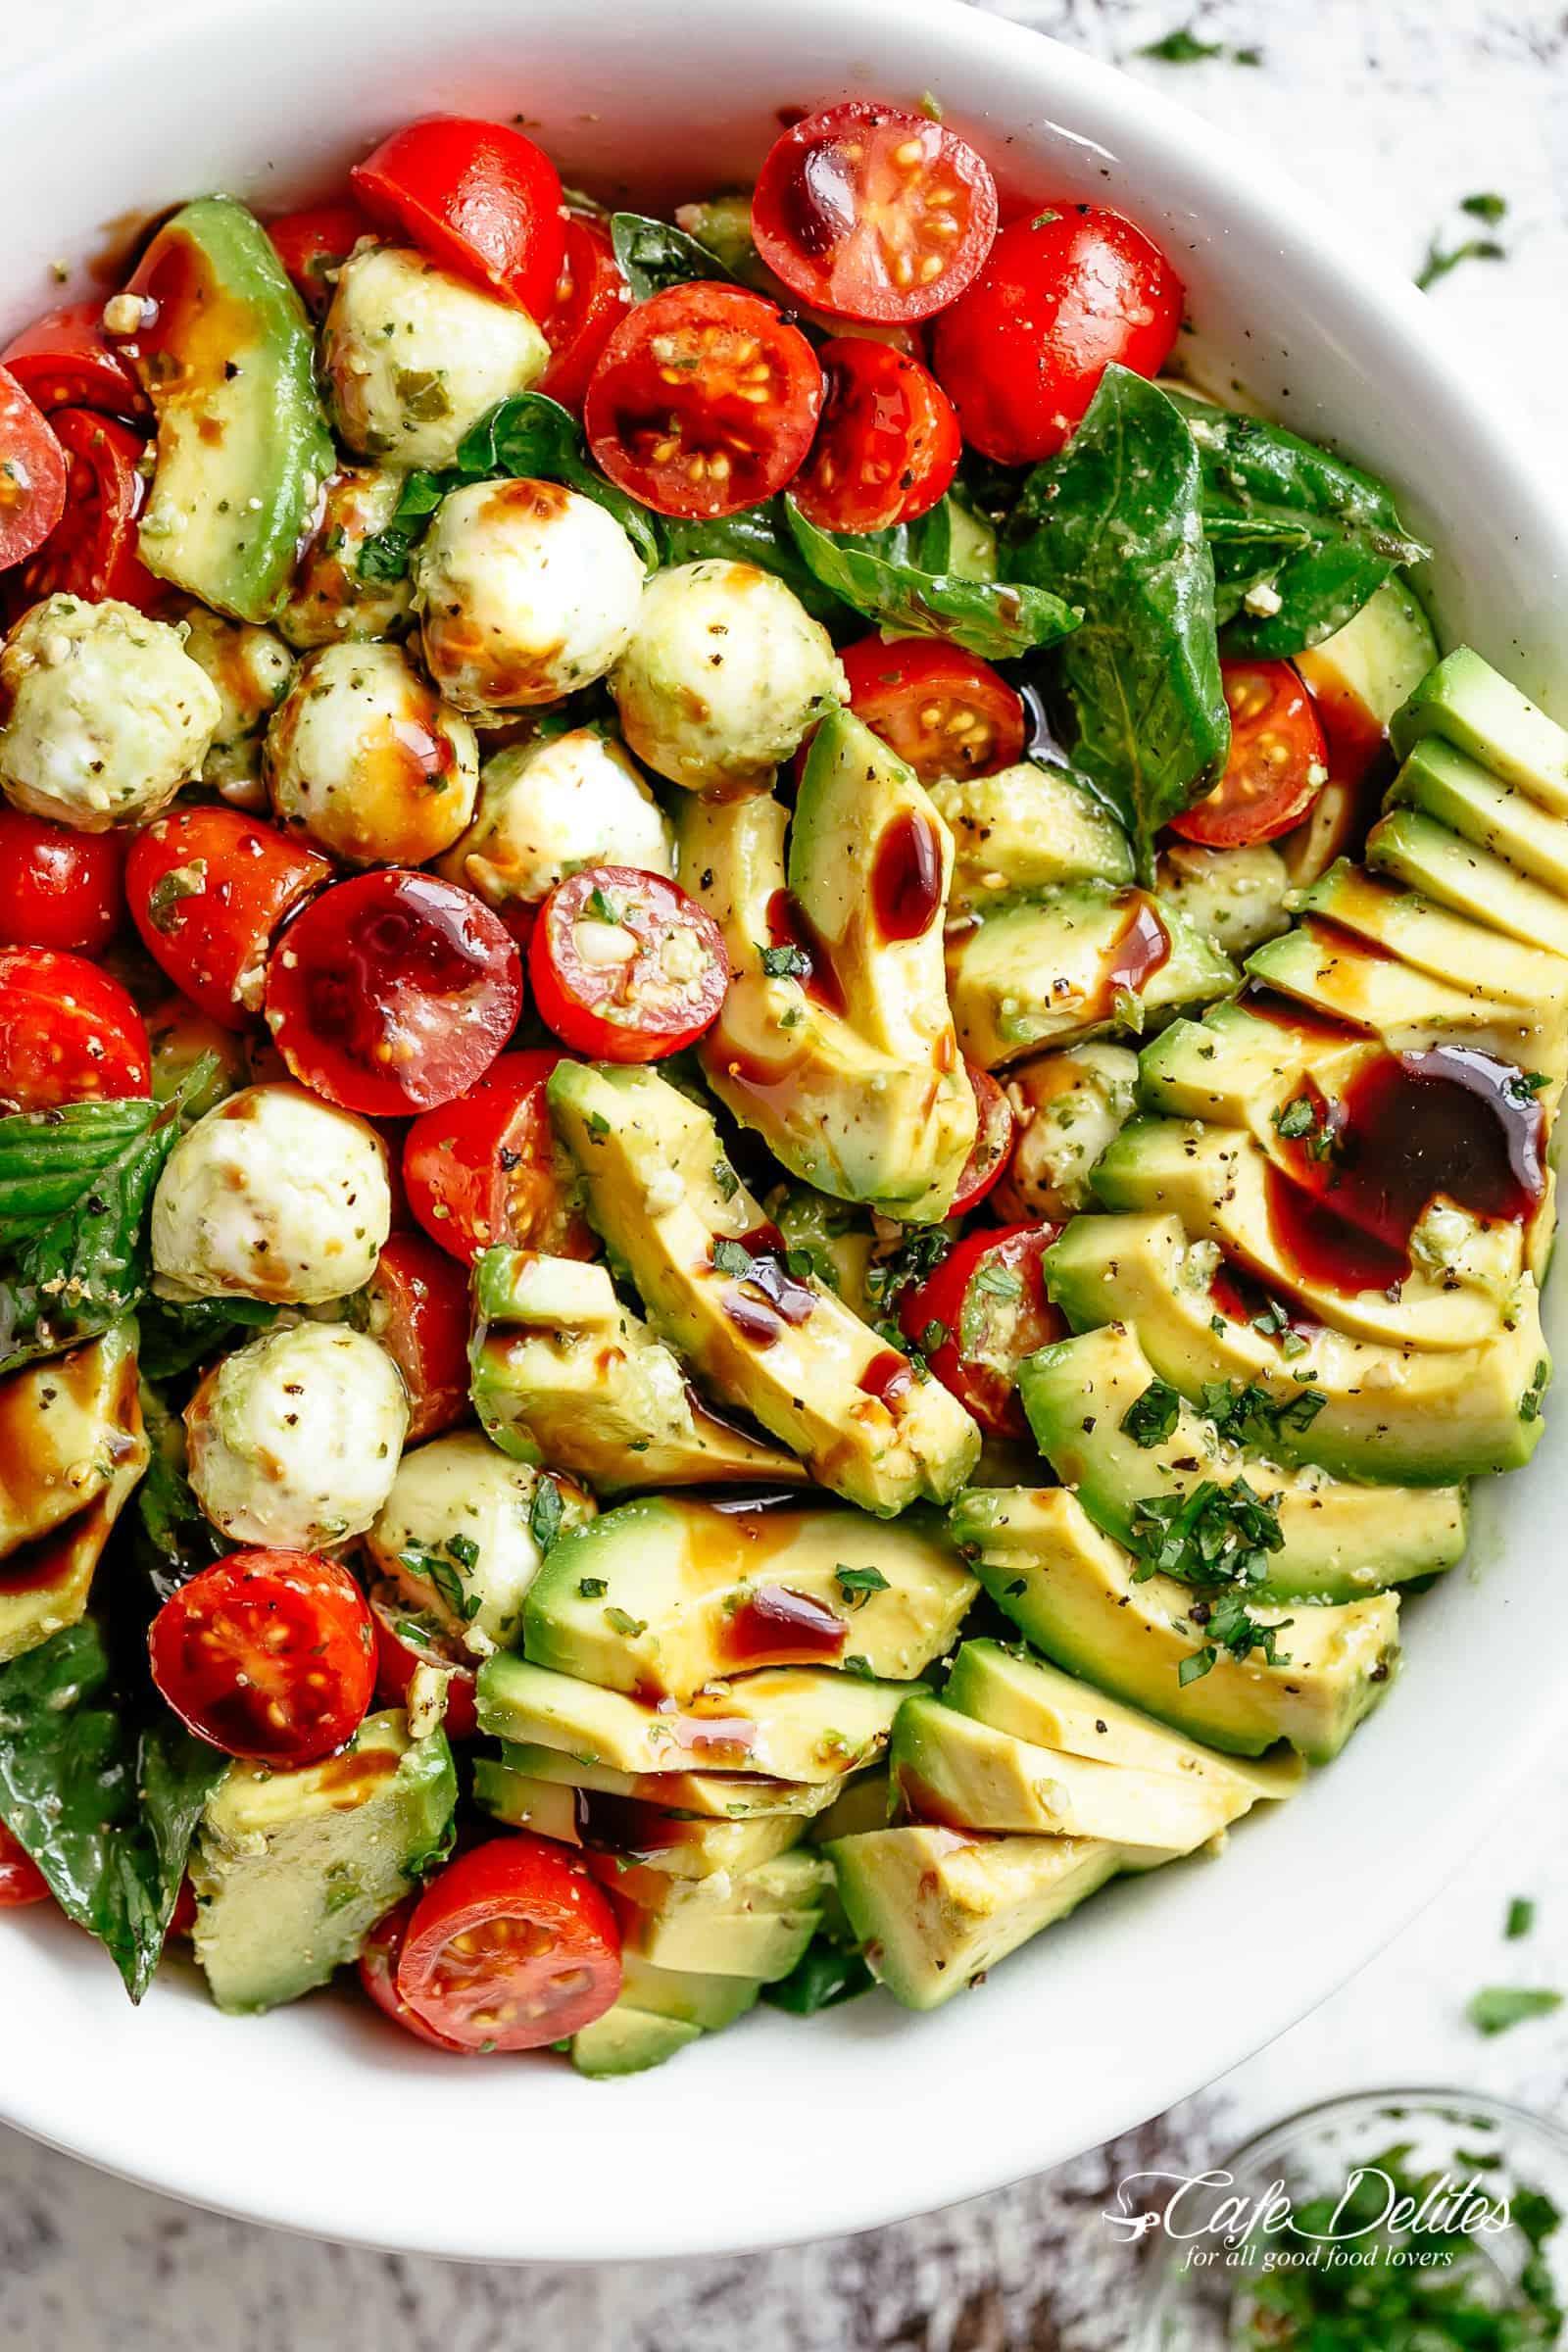 Salad from kirieshek. Delicious and original recipes